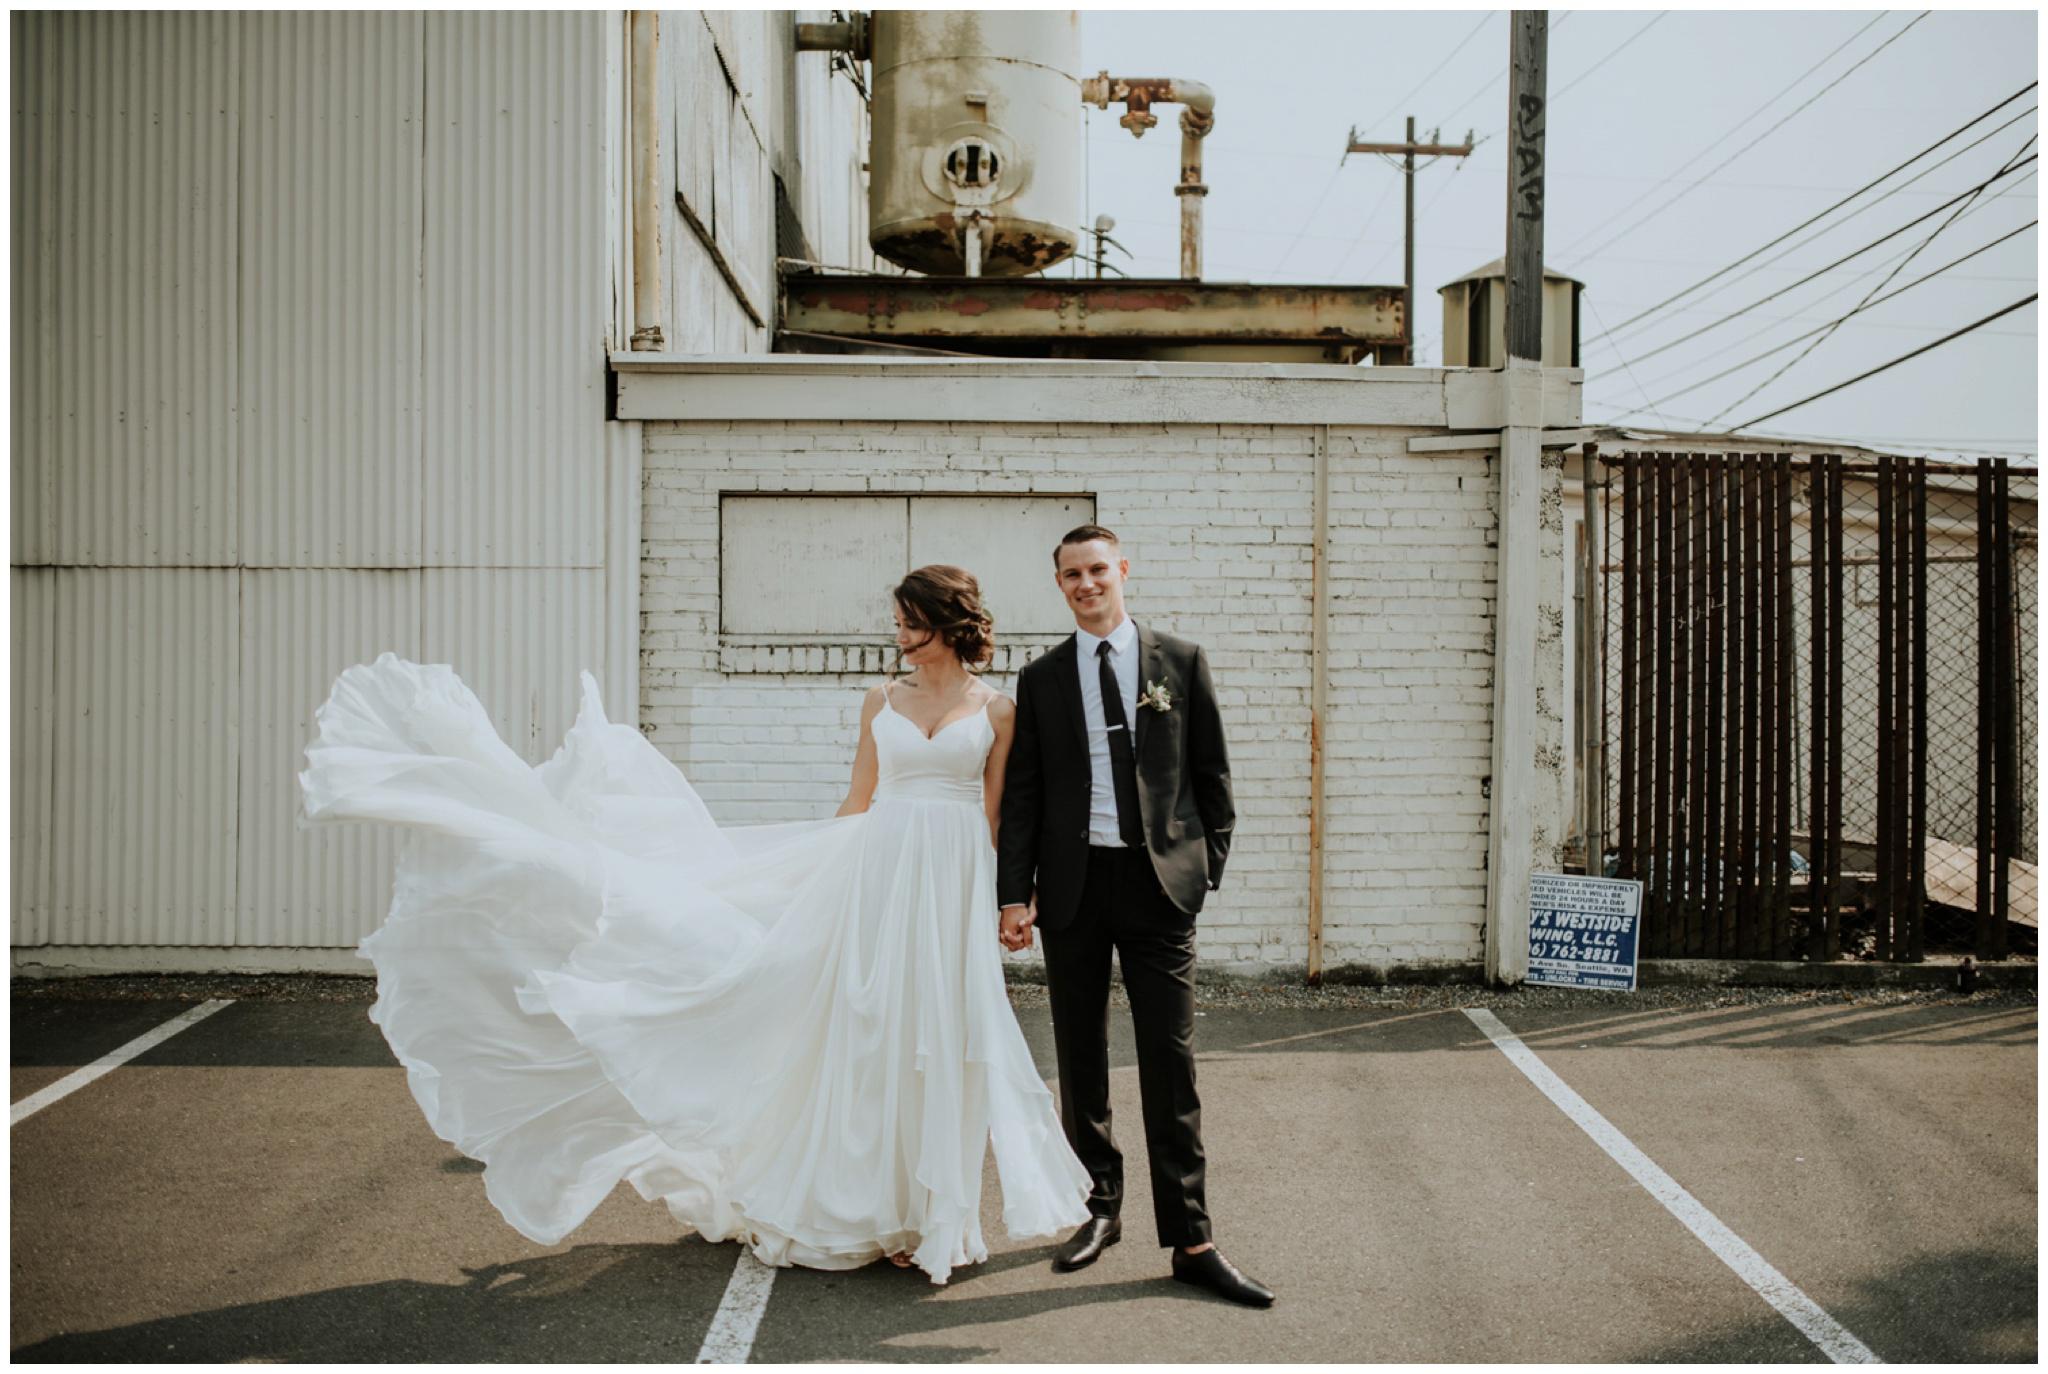 alyssa-keiran-westland-distillery-urban-seattle-wedding-photographer-caitlyn-nikula-76.jpg